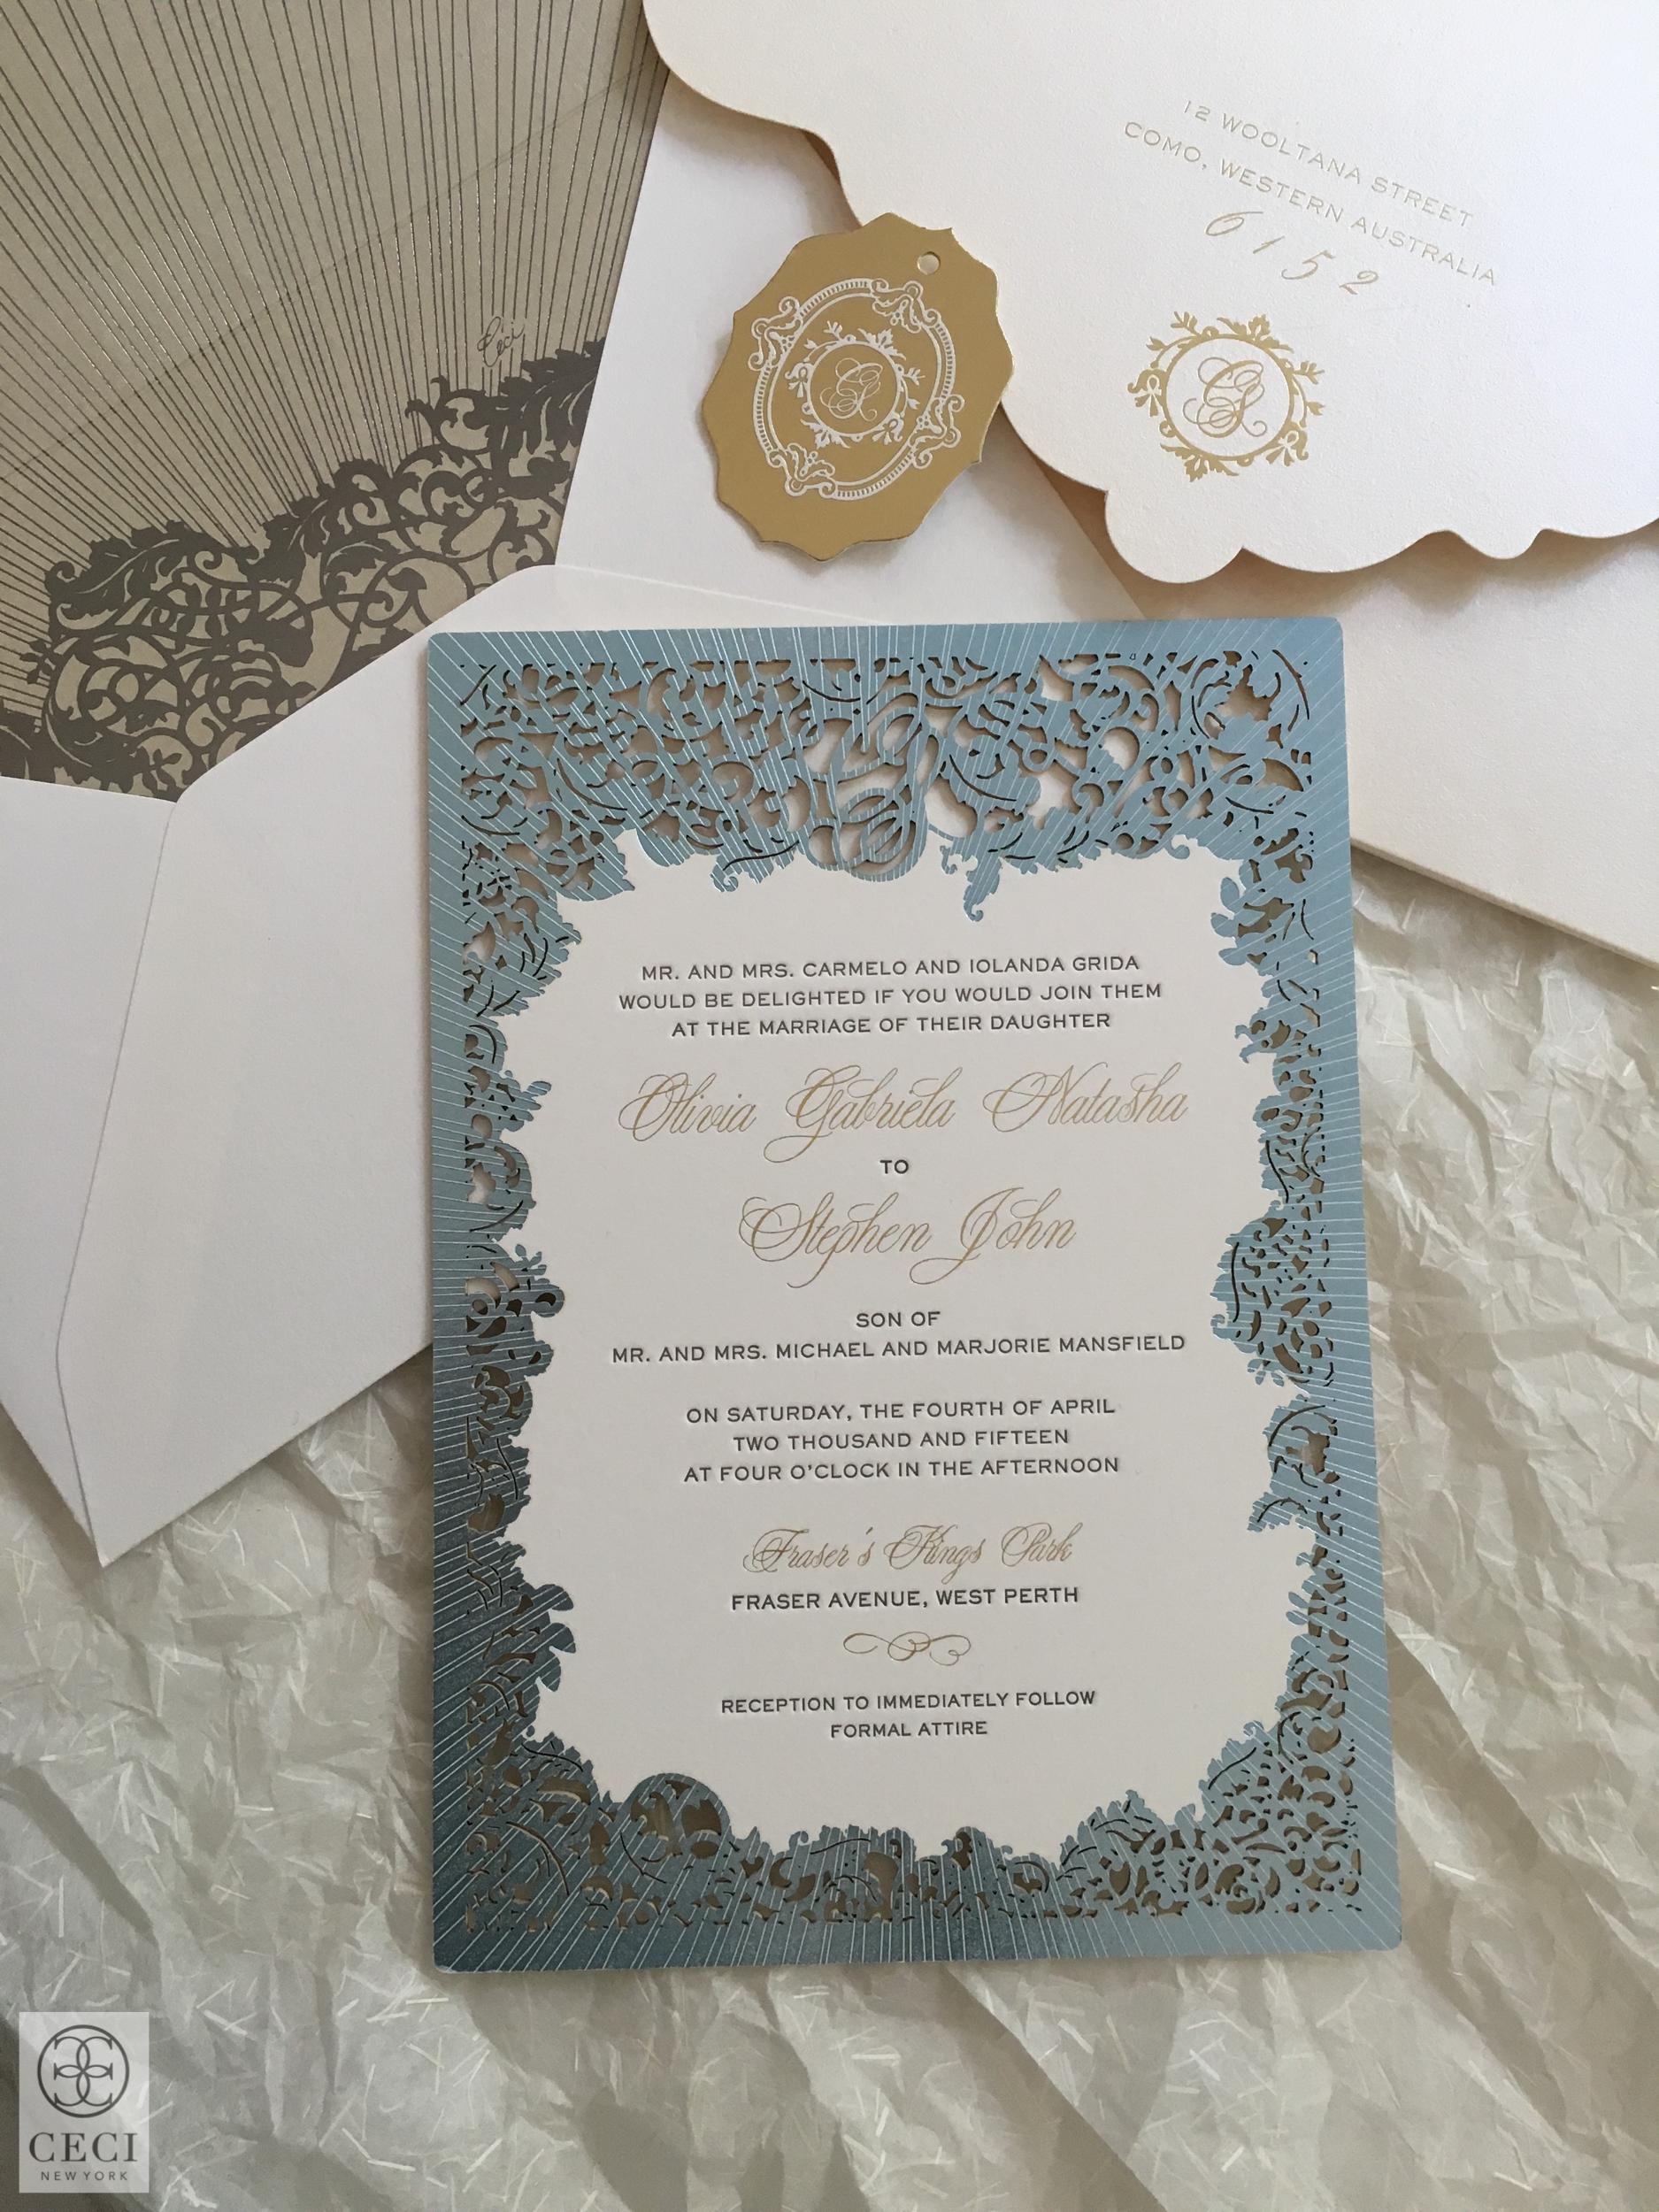 v2Ceci_New_York_Custom_Luxury_Wedding_BeautyShot_LaserCut_Stationery_Personalized_Couture_Foil_Stamping_Perth_Destination_Australia_Chic_-10.jpg